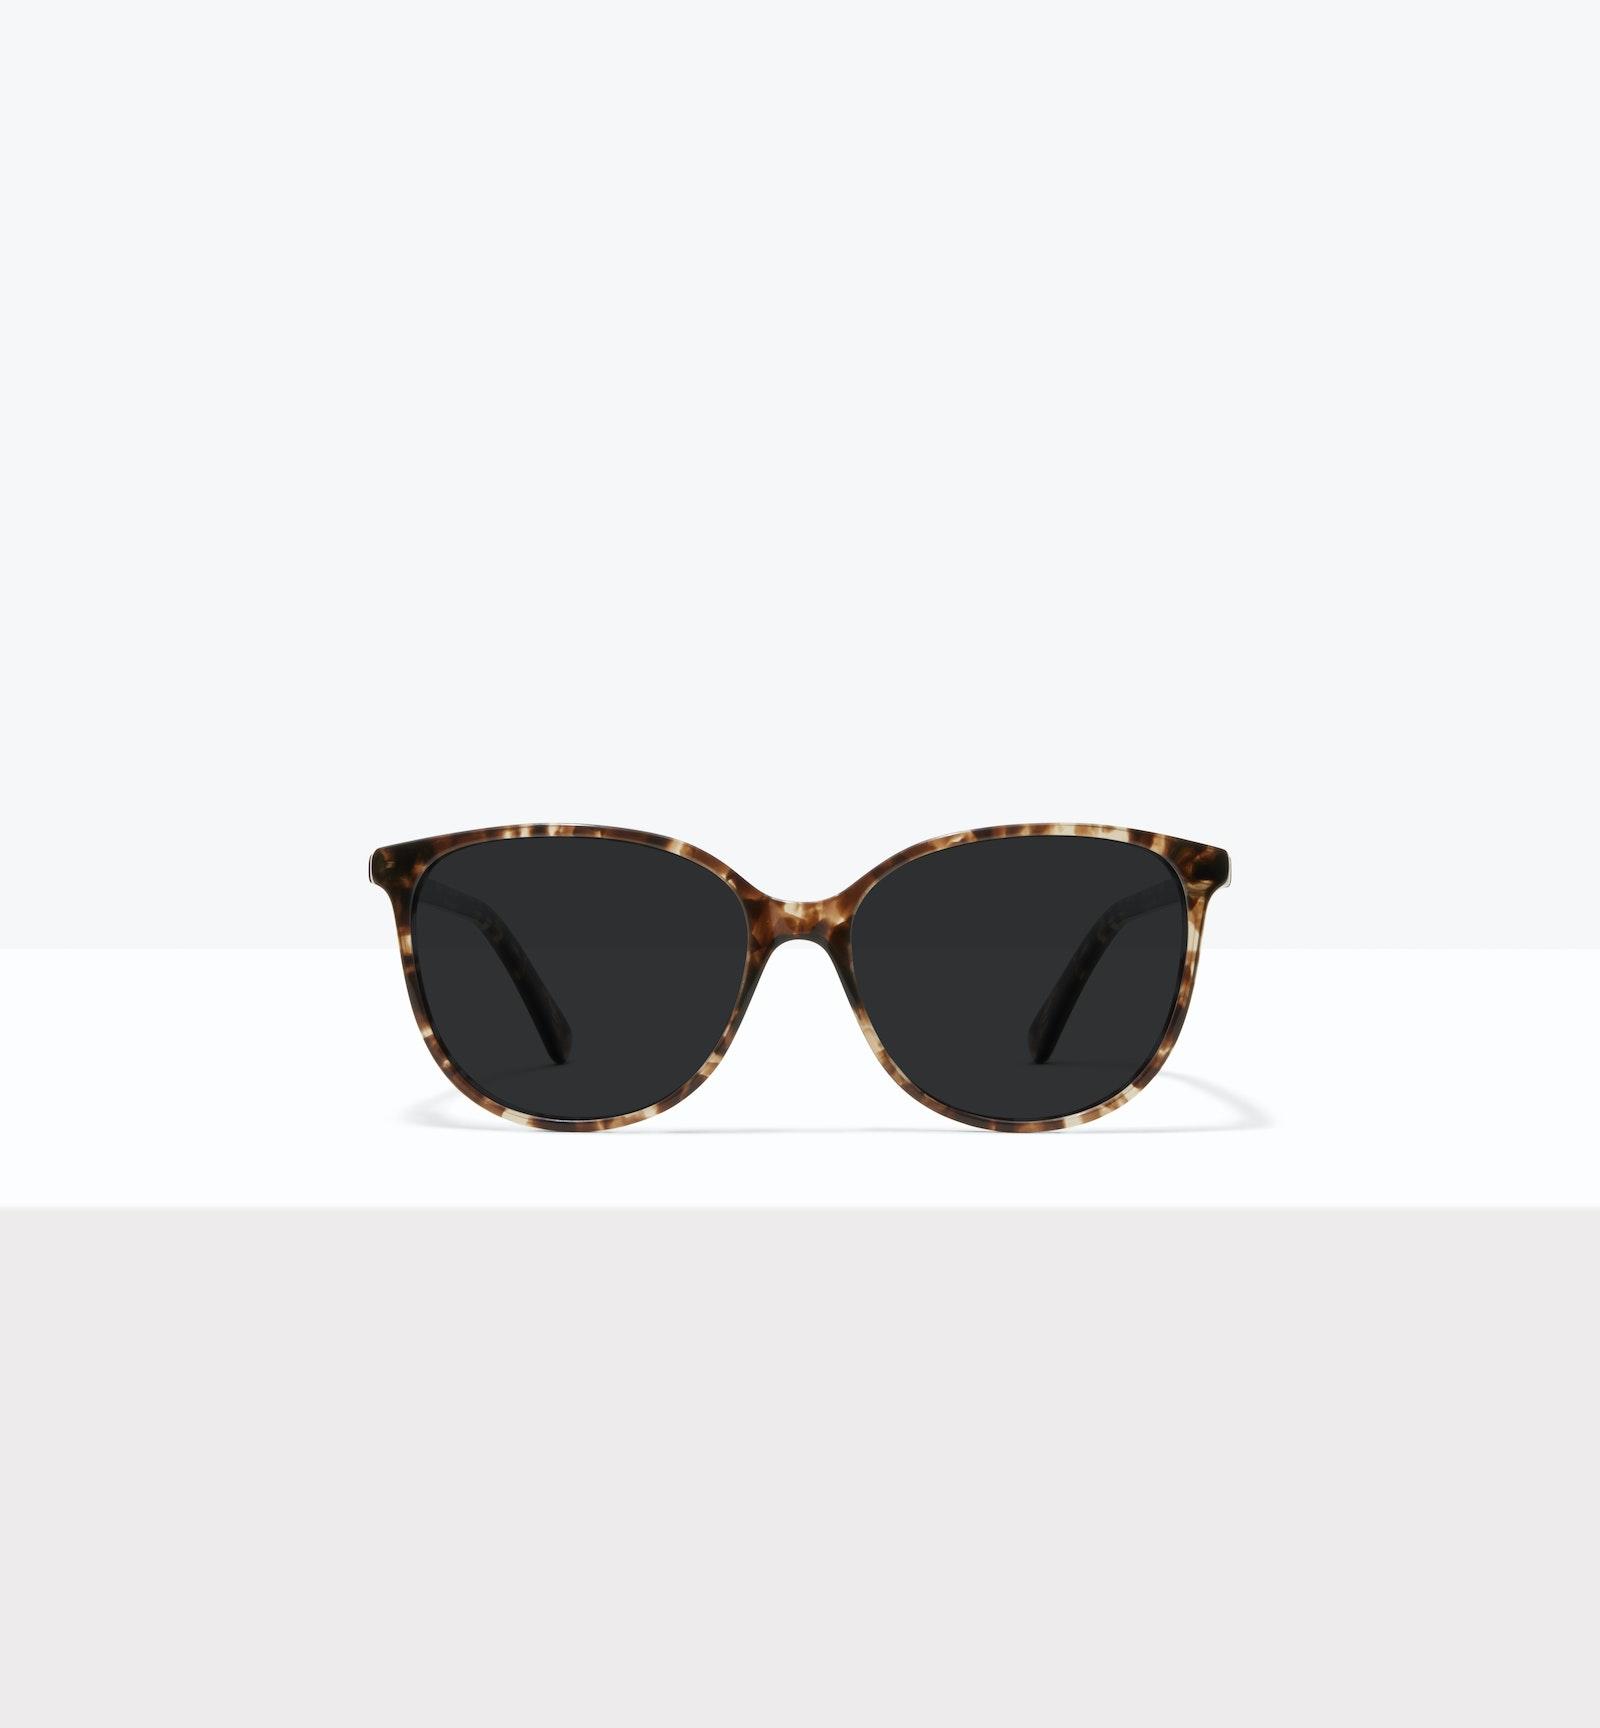 Affordable Fashion Glasses Cat Eye Sunglasses Women Imagine XL Leopard